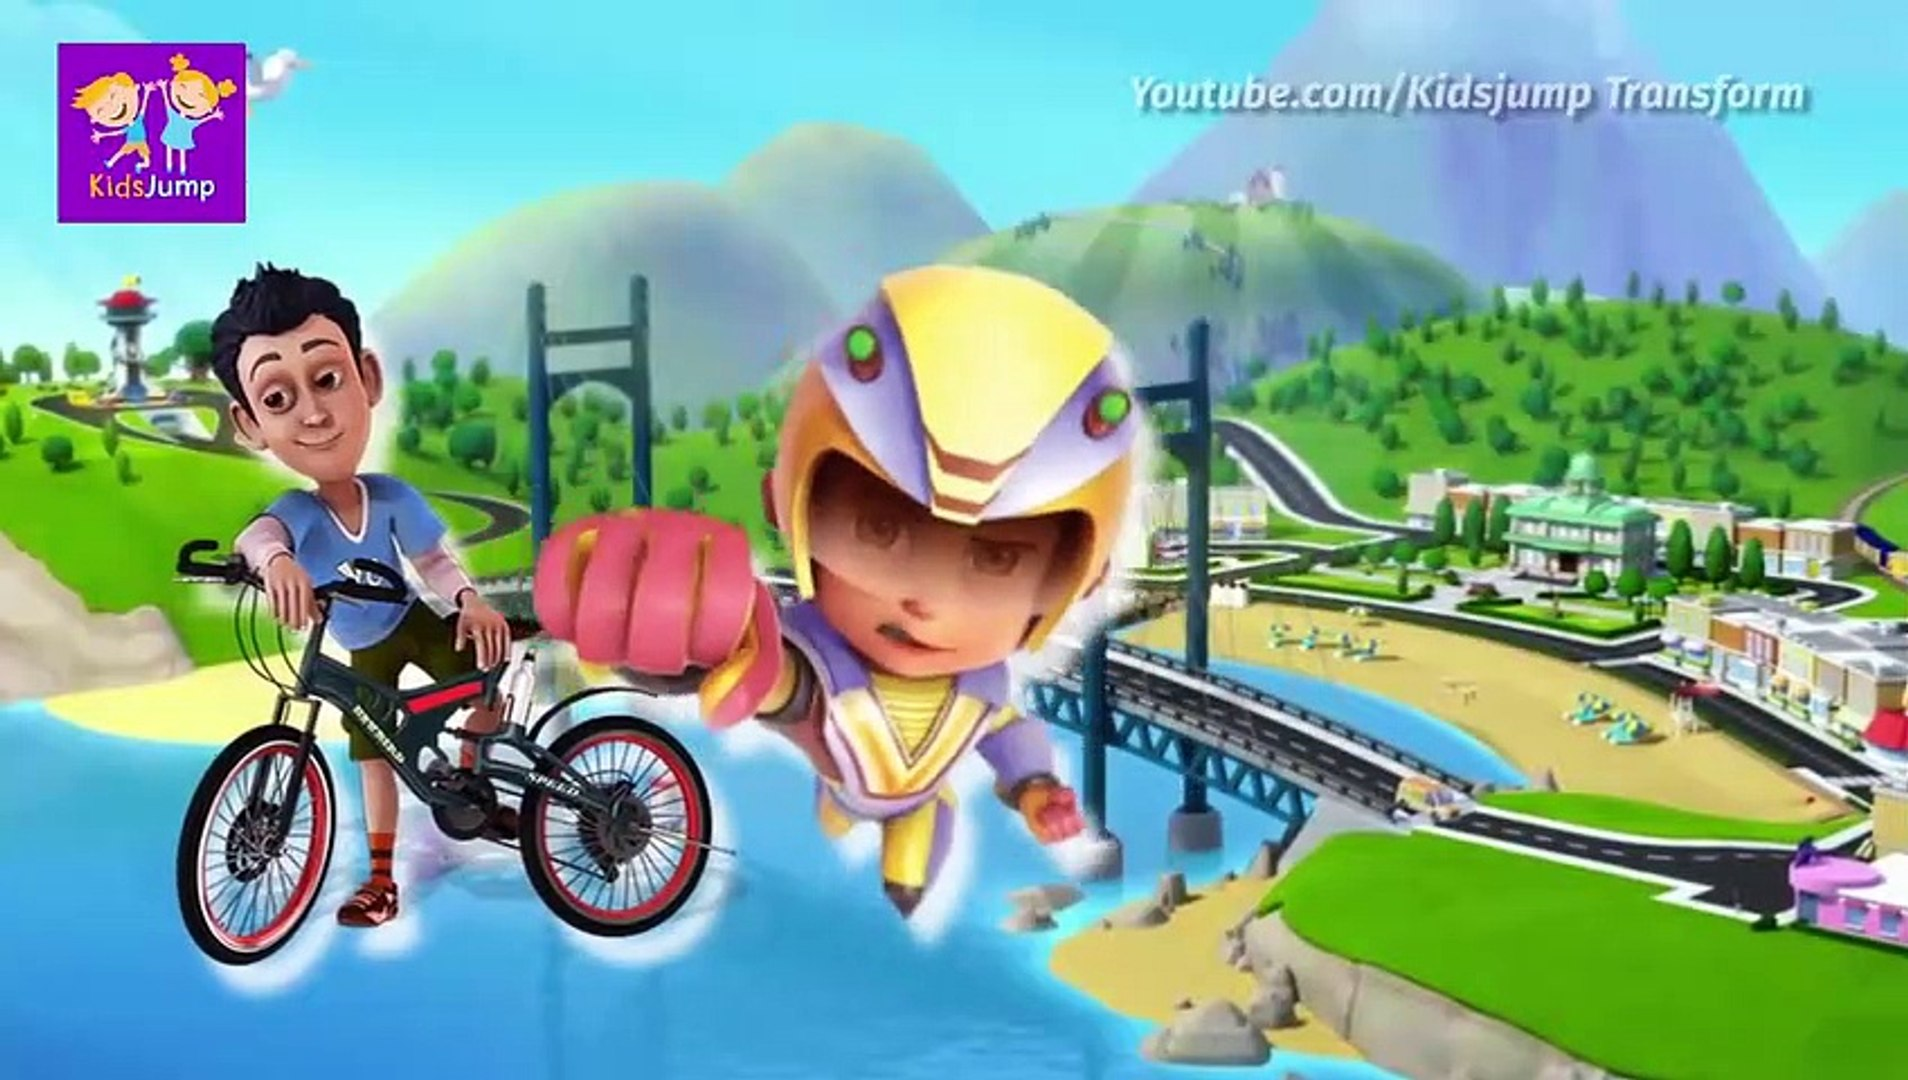 Shiva Cartoon VS VIR THE ROBOT BOY #02 Full Episode TV Movie Cartoon For  Kids ANTV , Tv hd 2019 cinema comedy action